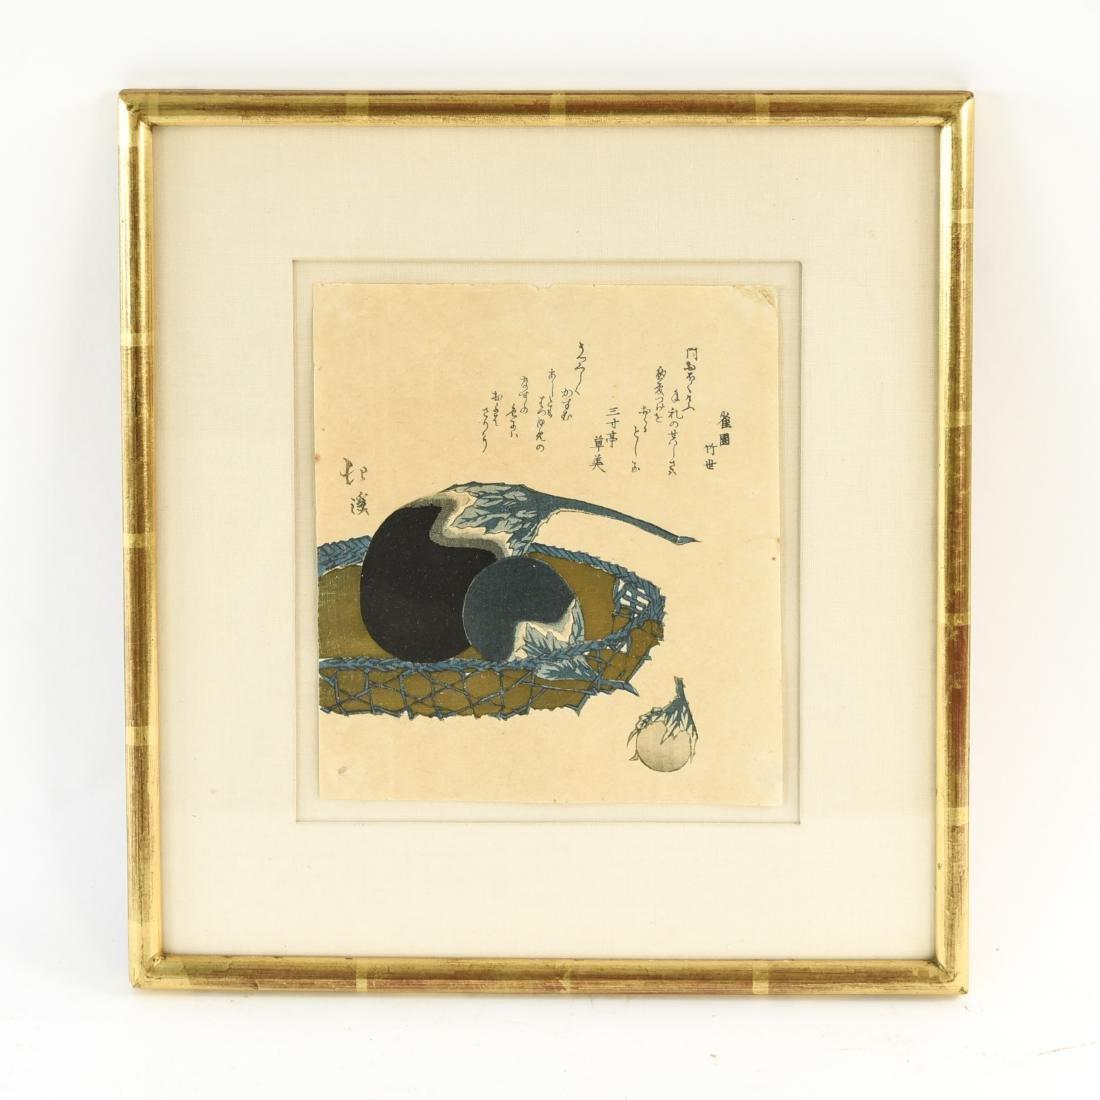 AFTER HOKKEI TOTOYA (JAPAN 1780-1850) PRINT